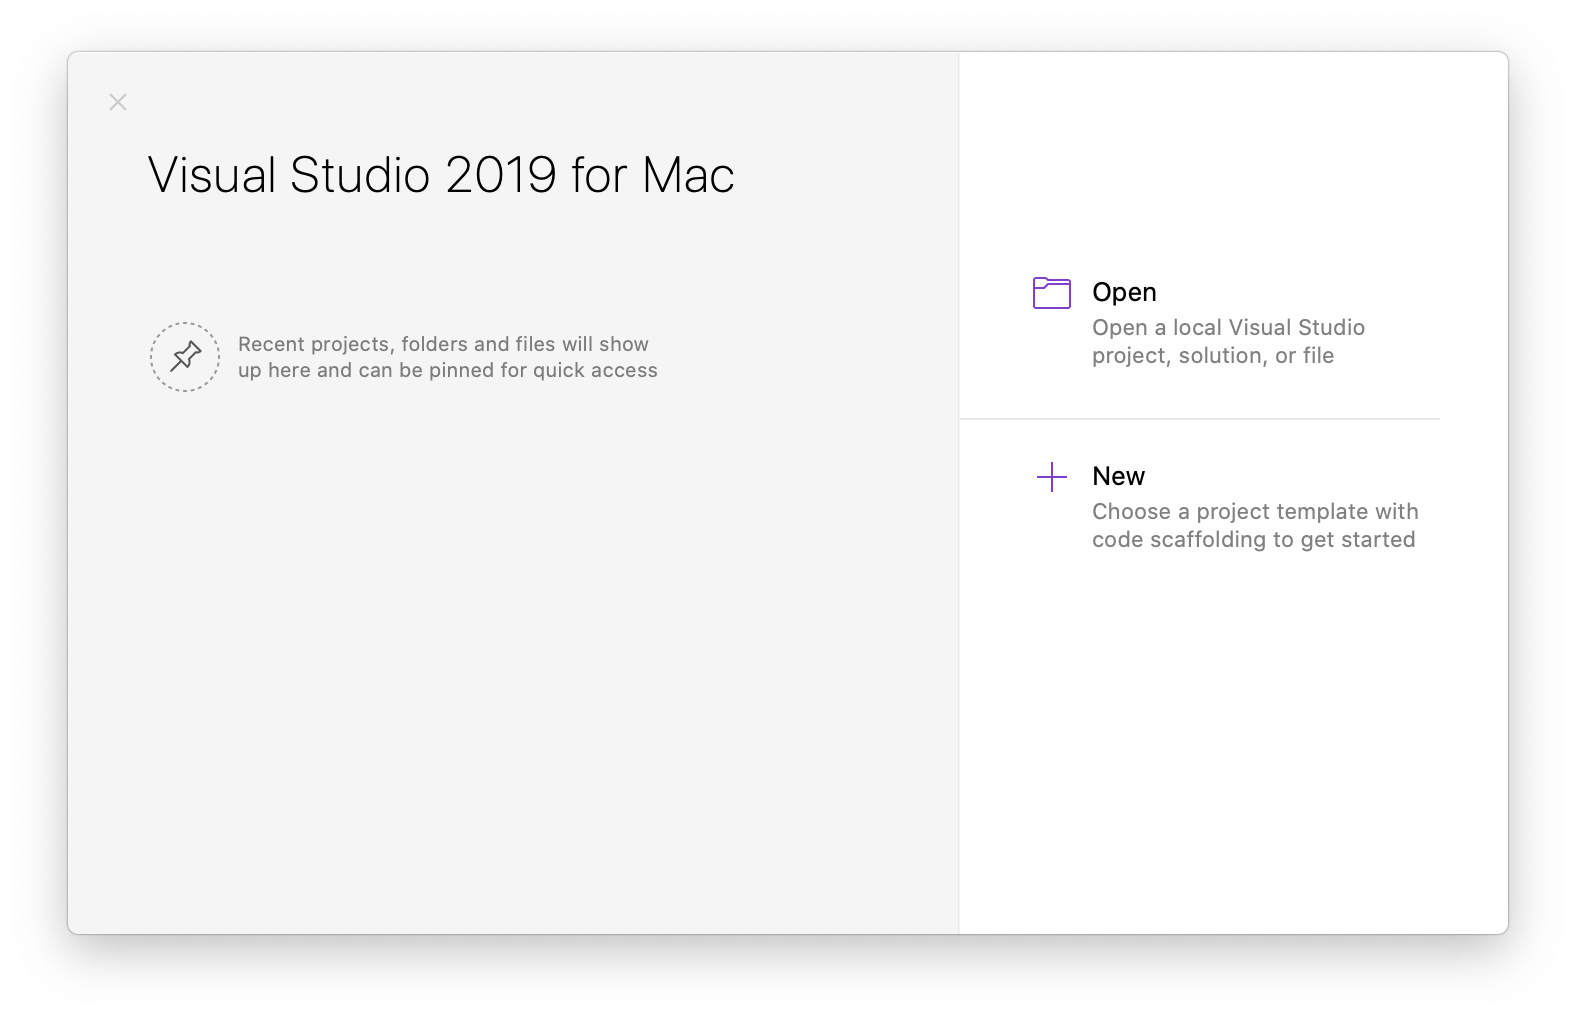 Visual Studio starting page